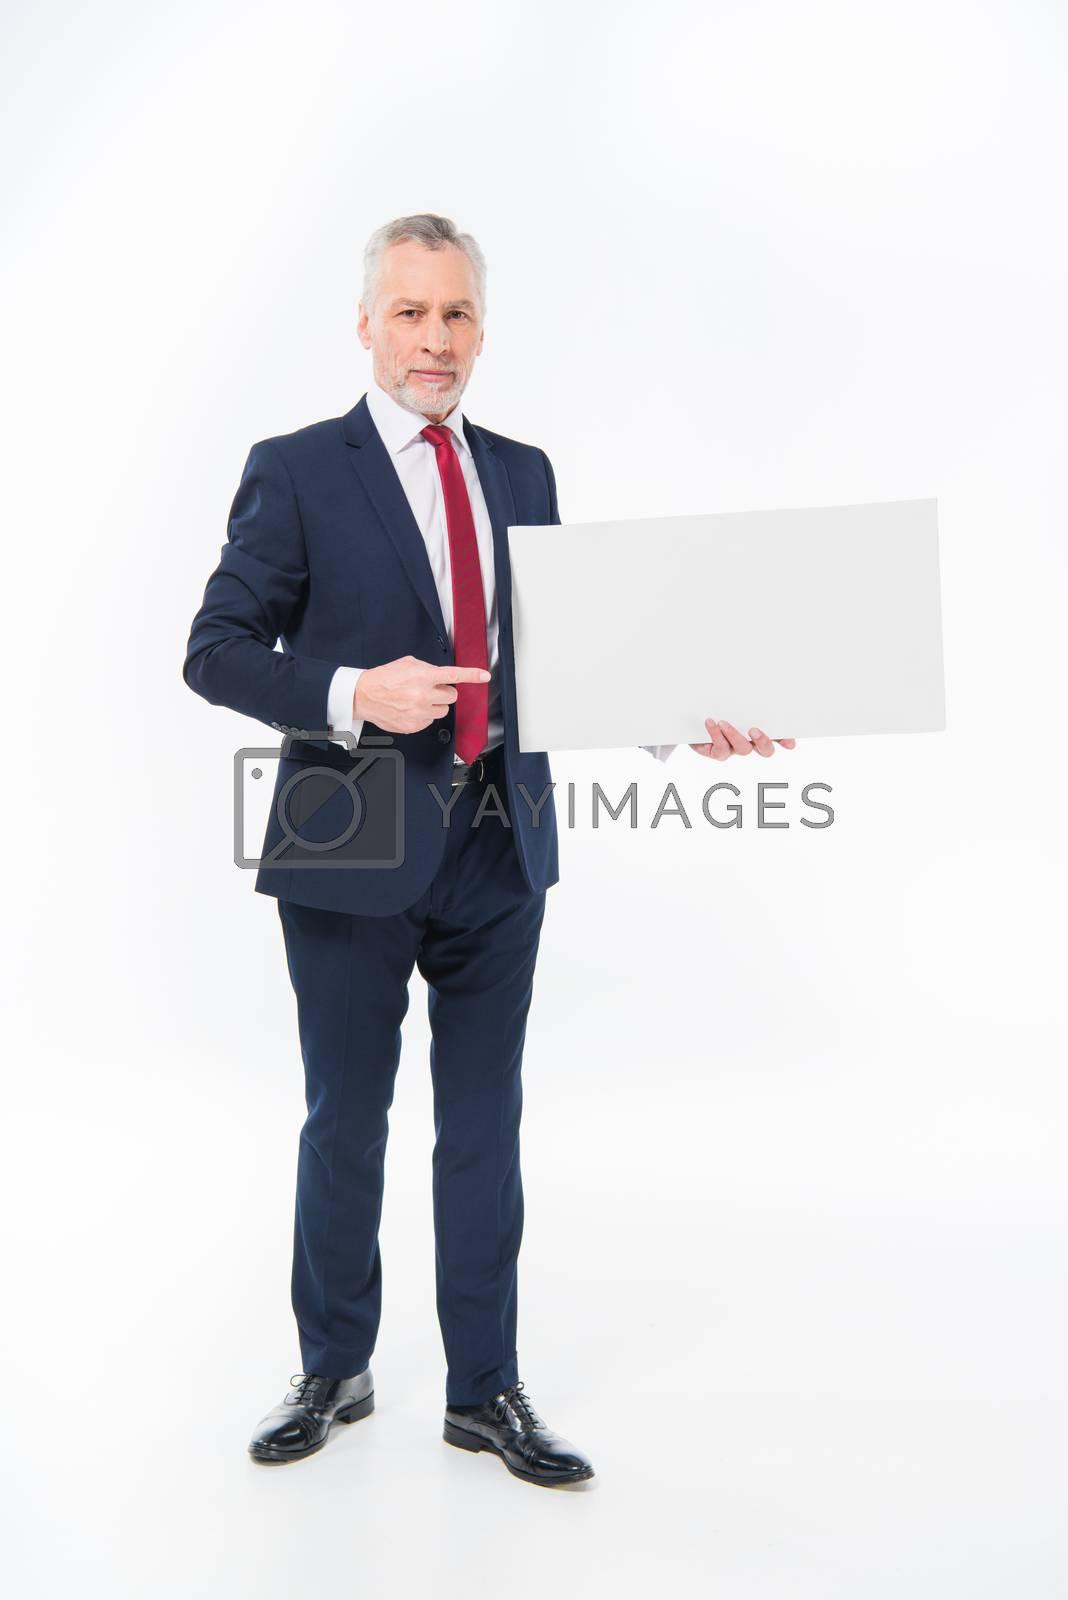 Royalty free image of Businessman holding blank card by LightFieldStudios